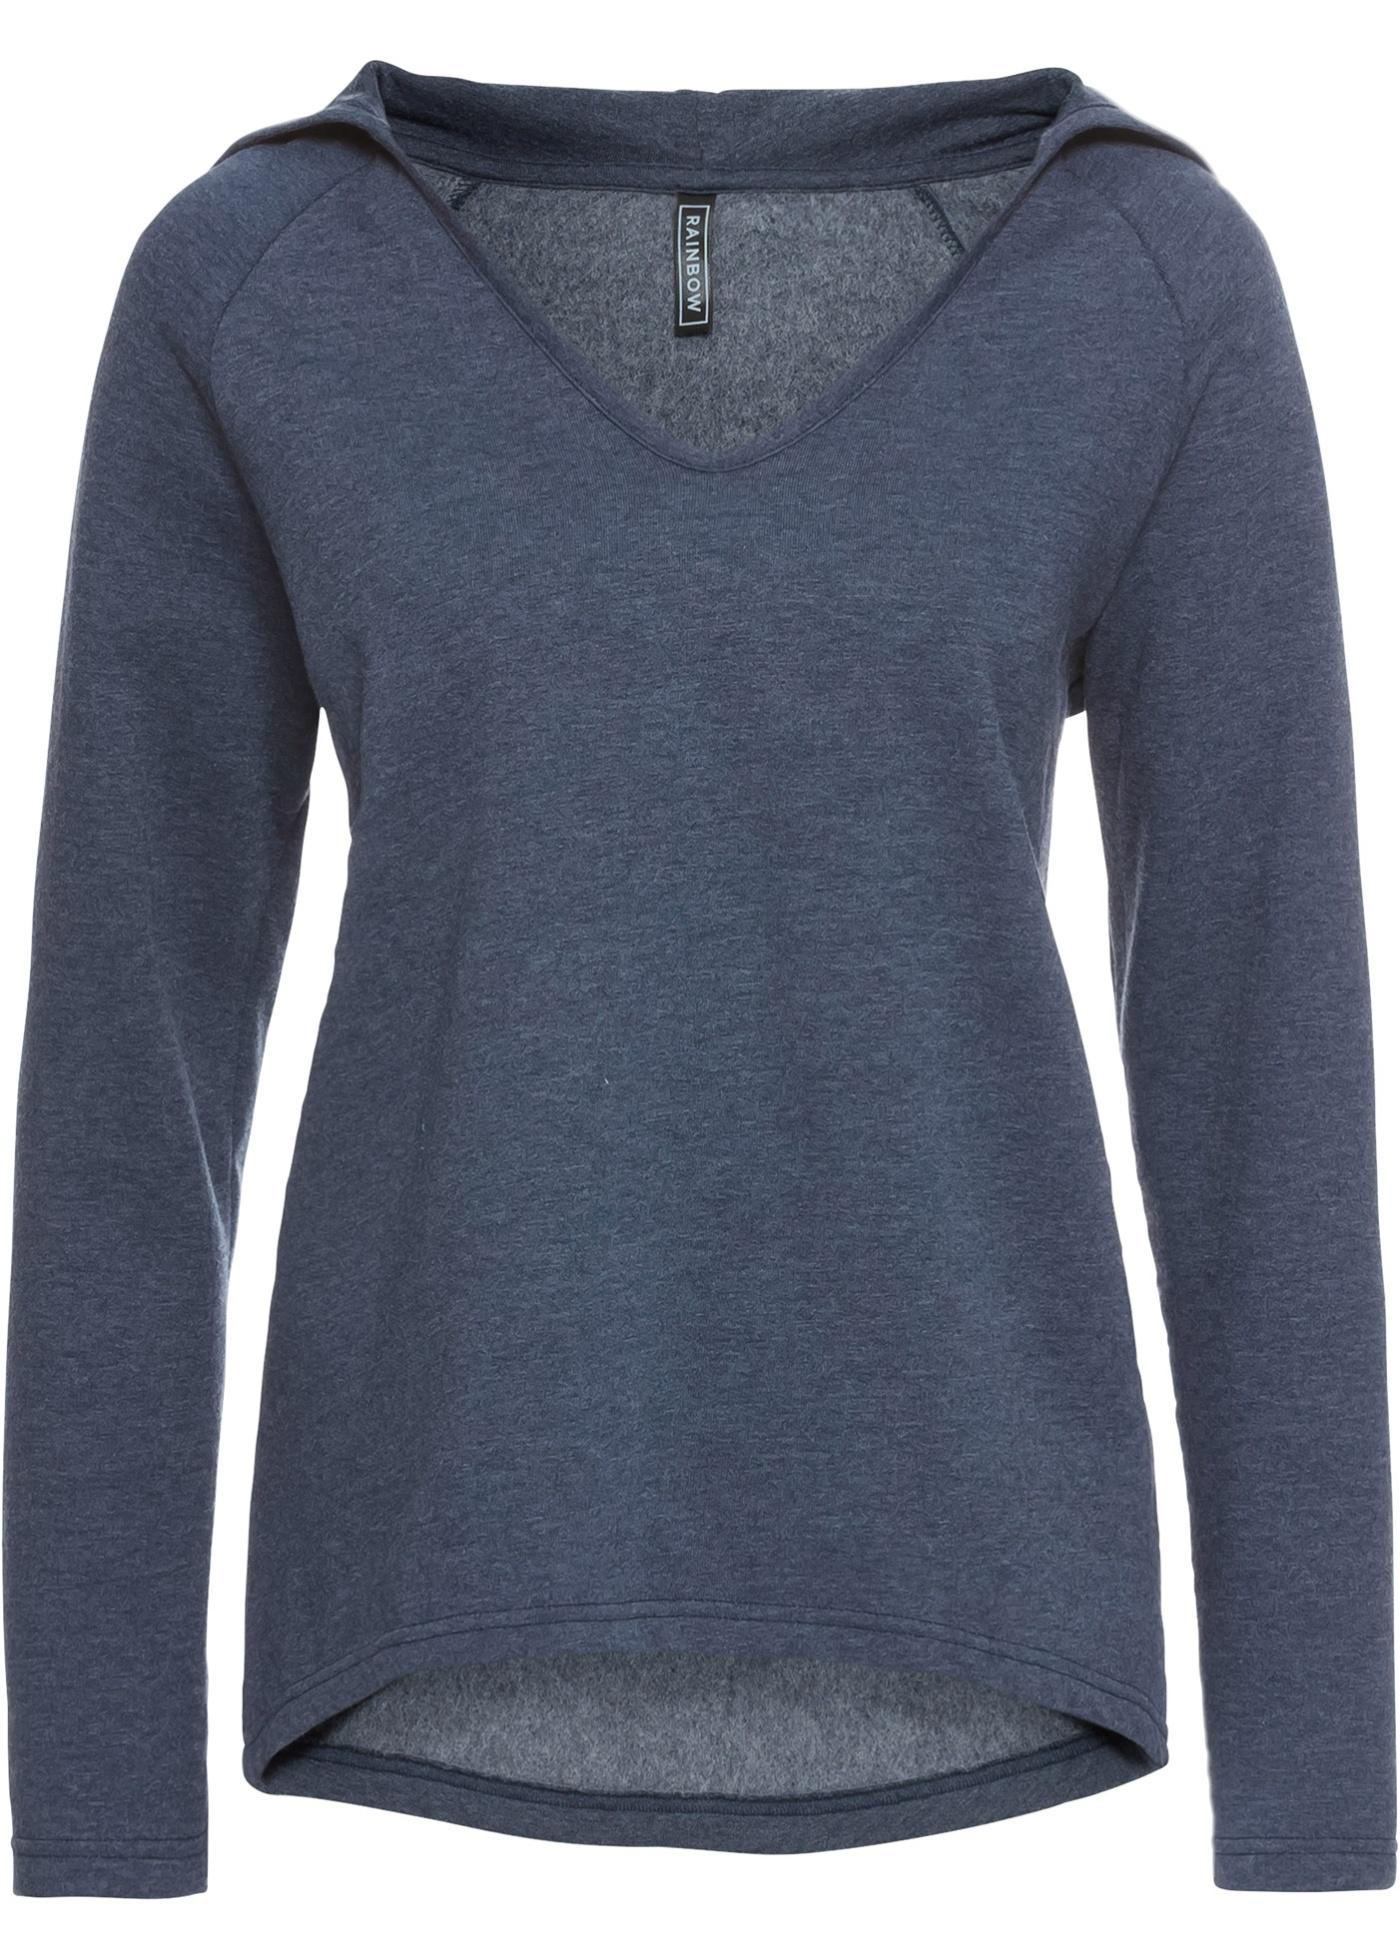 Oversize Kapuzen- Sweatshirt jetztbilligerkaufen